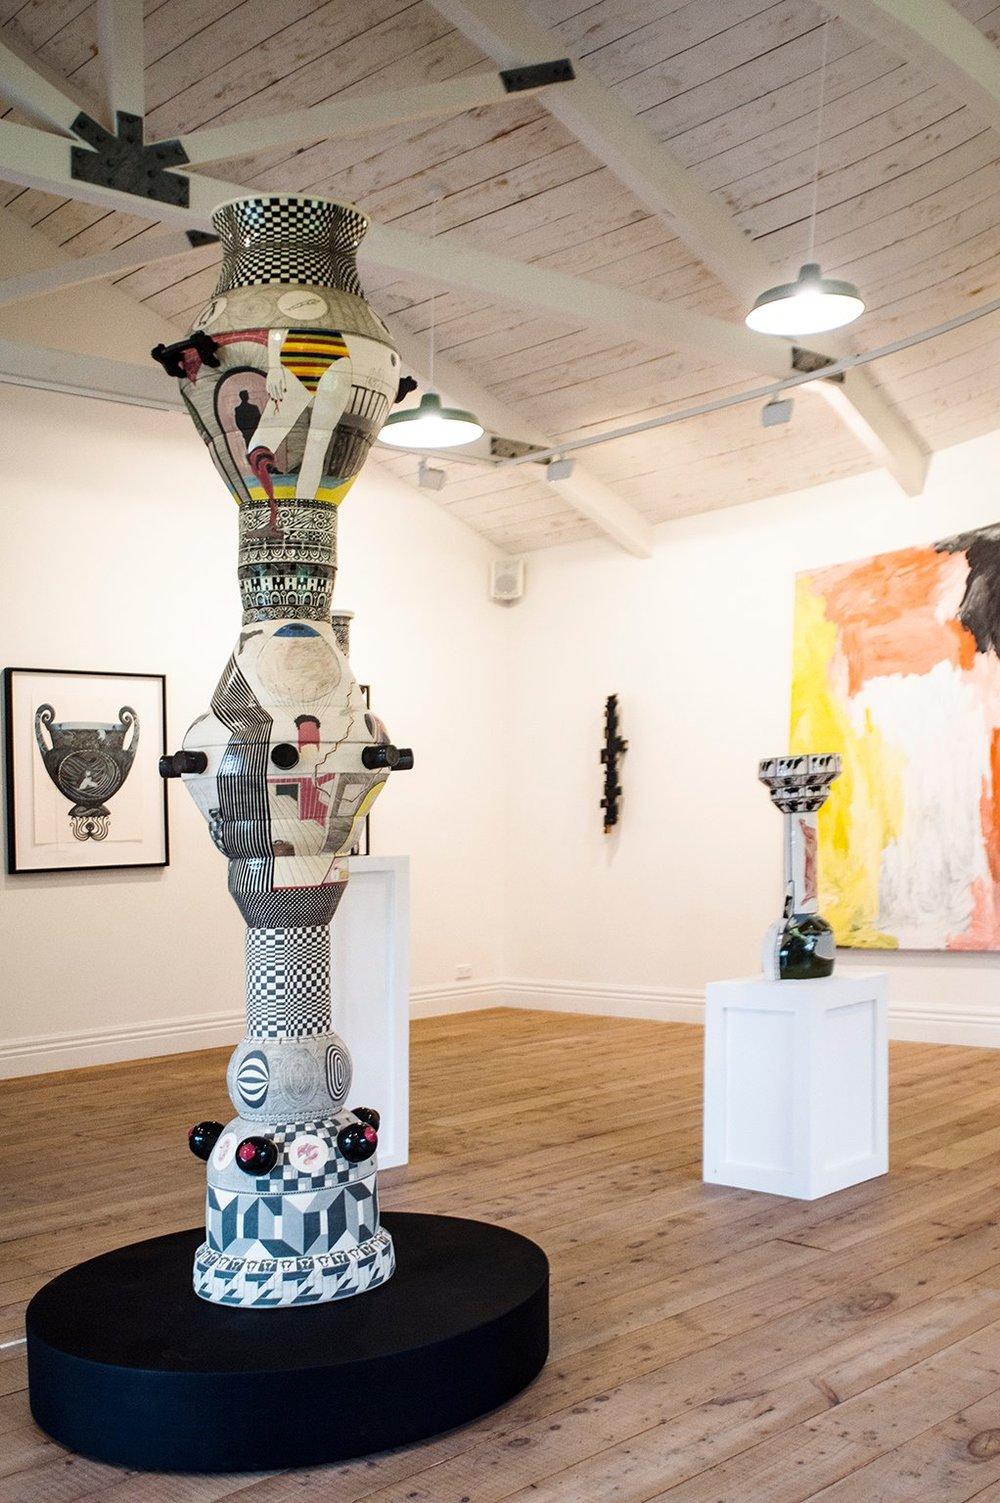 North Gallery